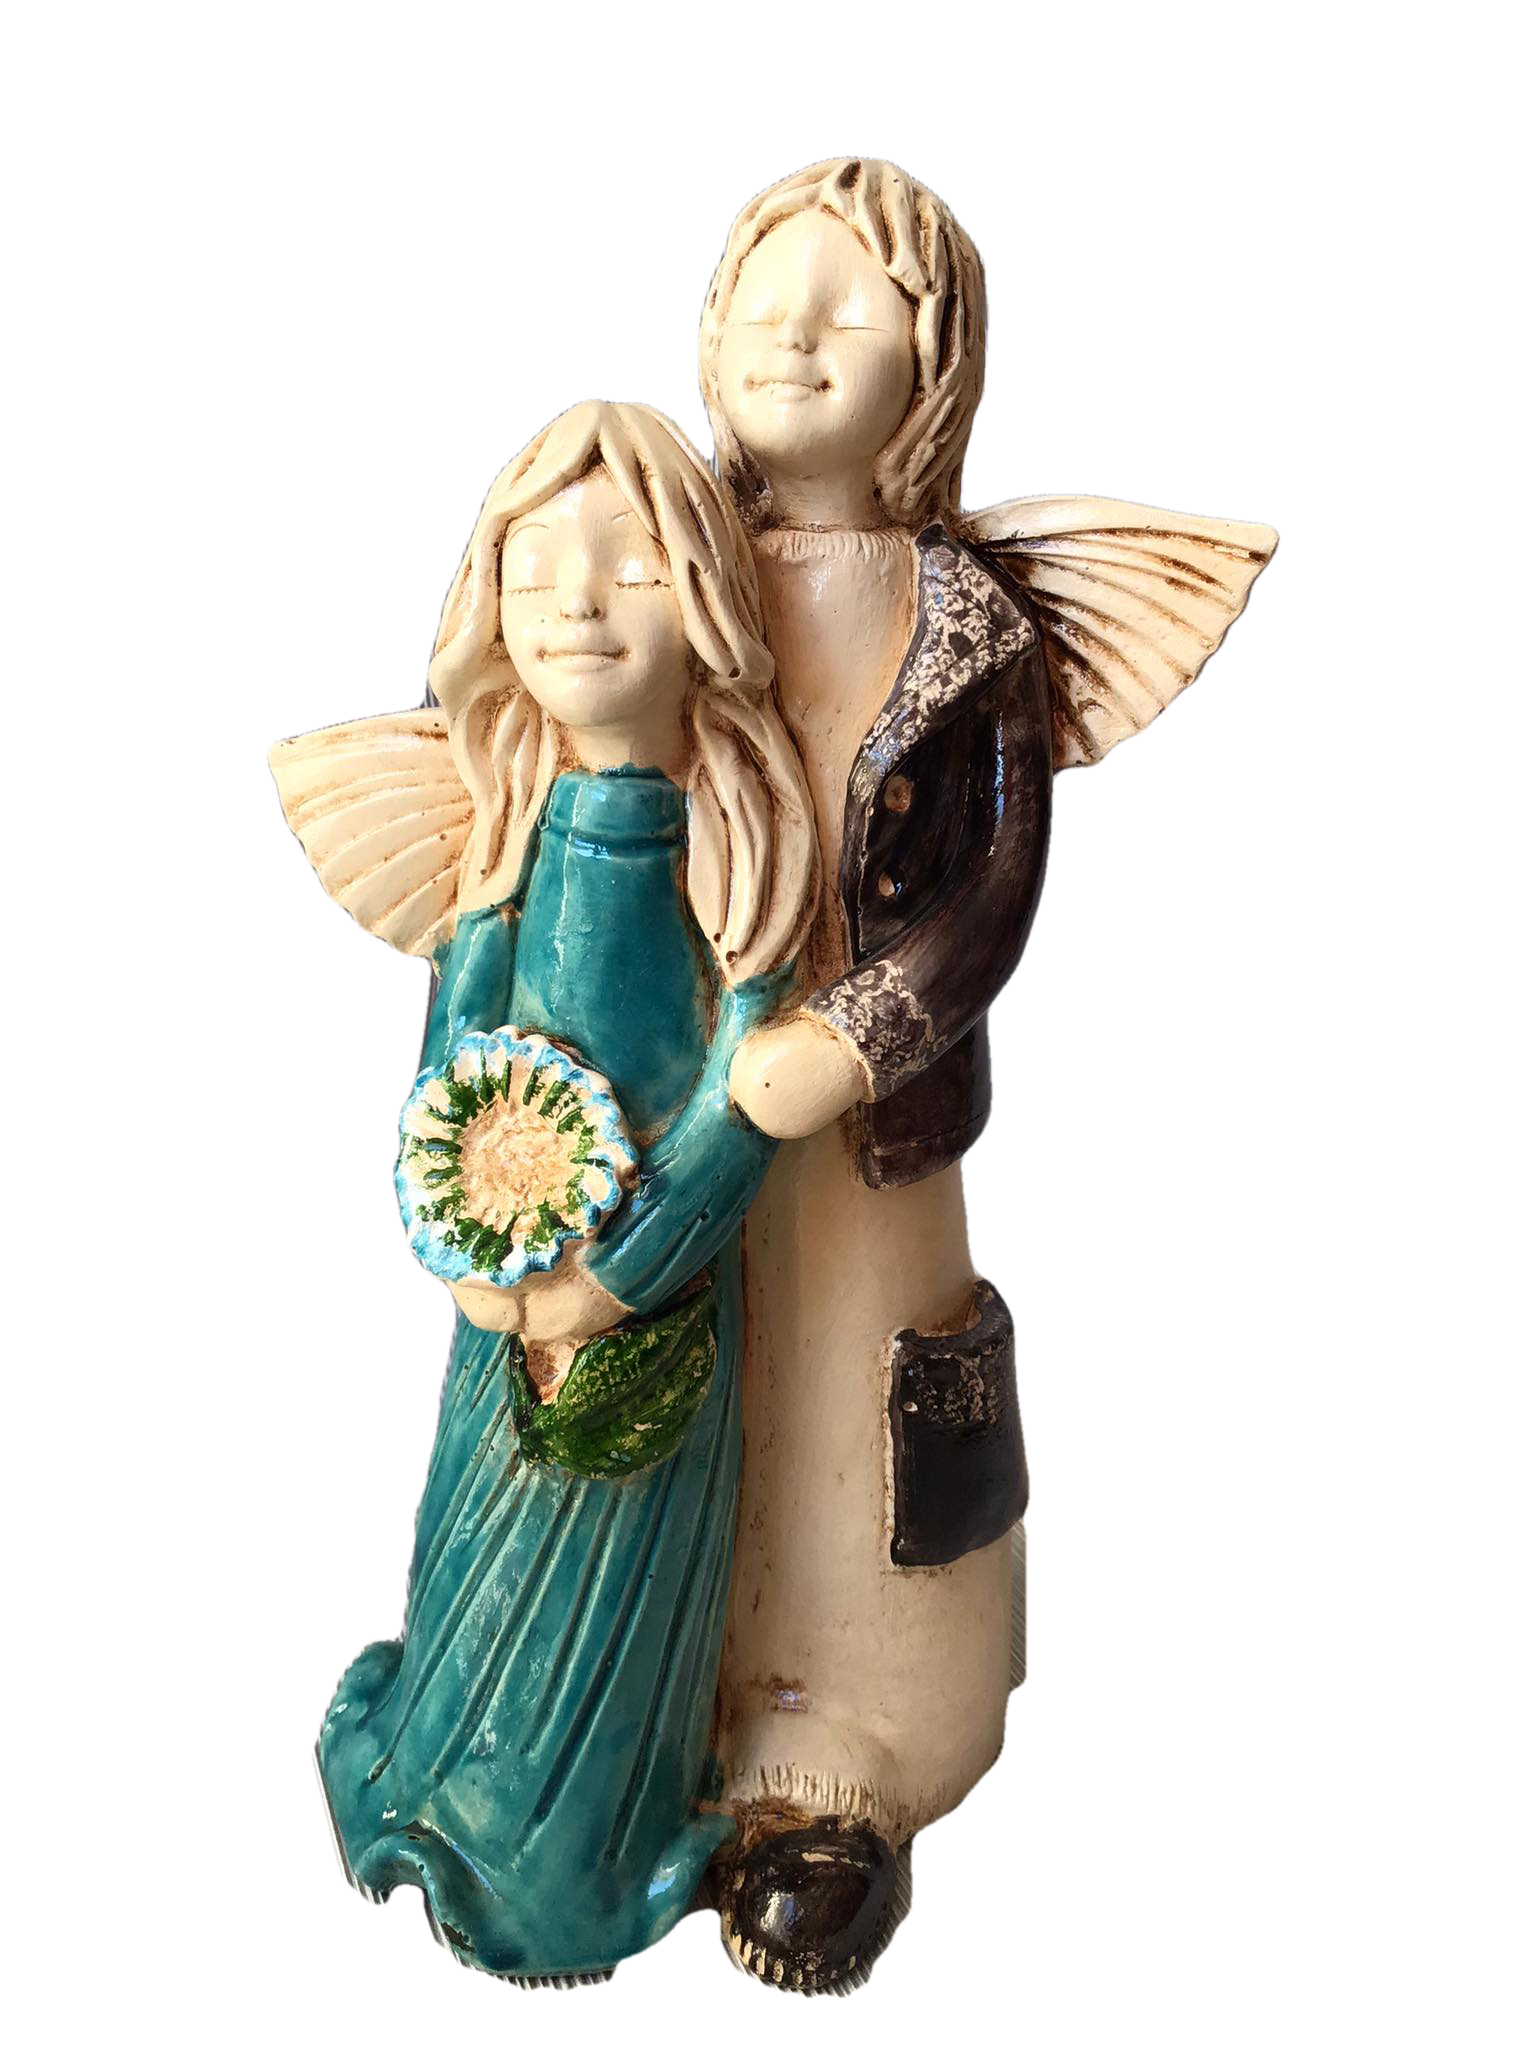 Anioł Sari&Sam6a